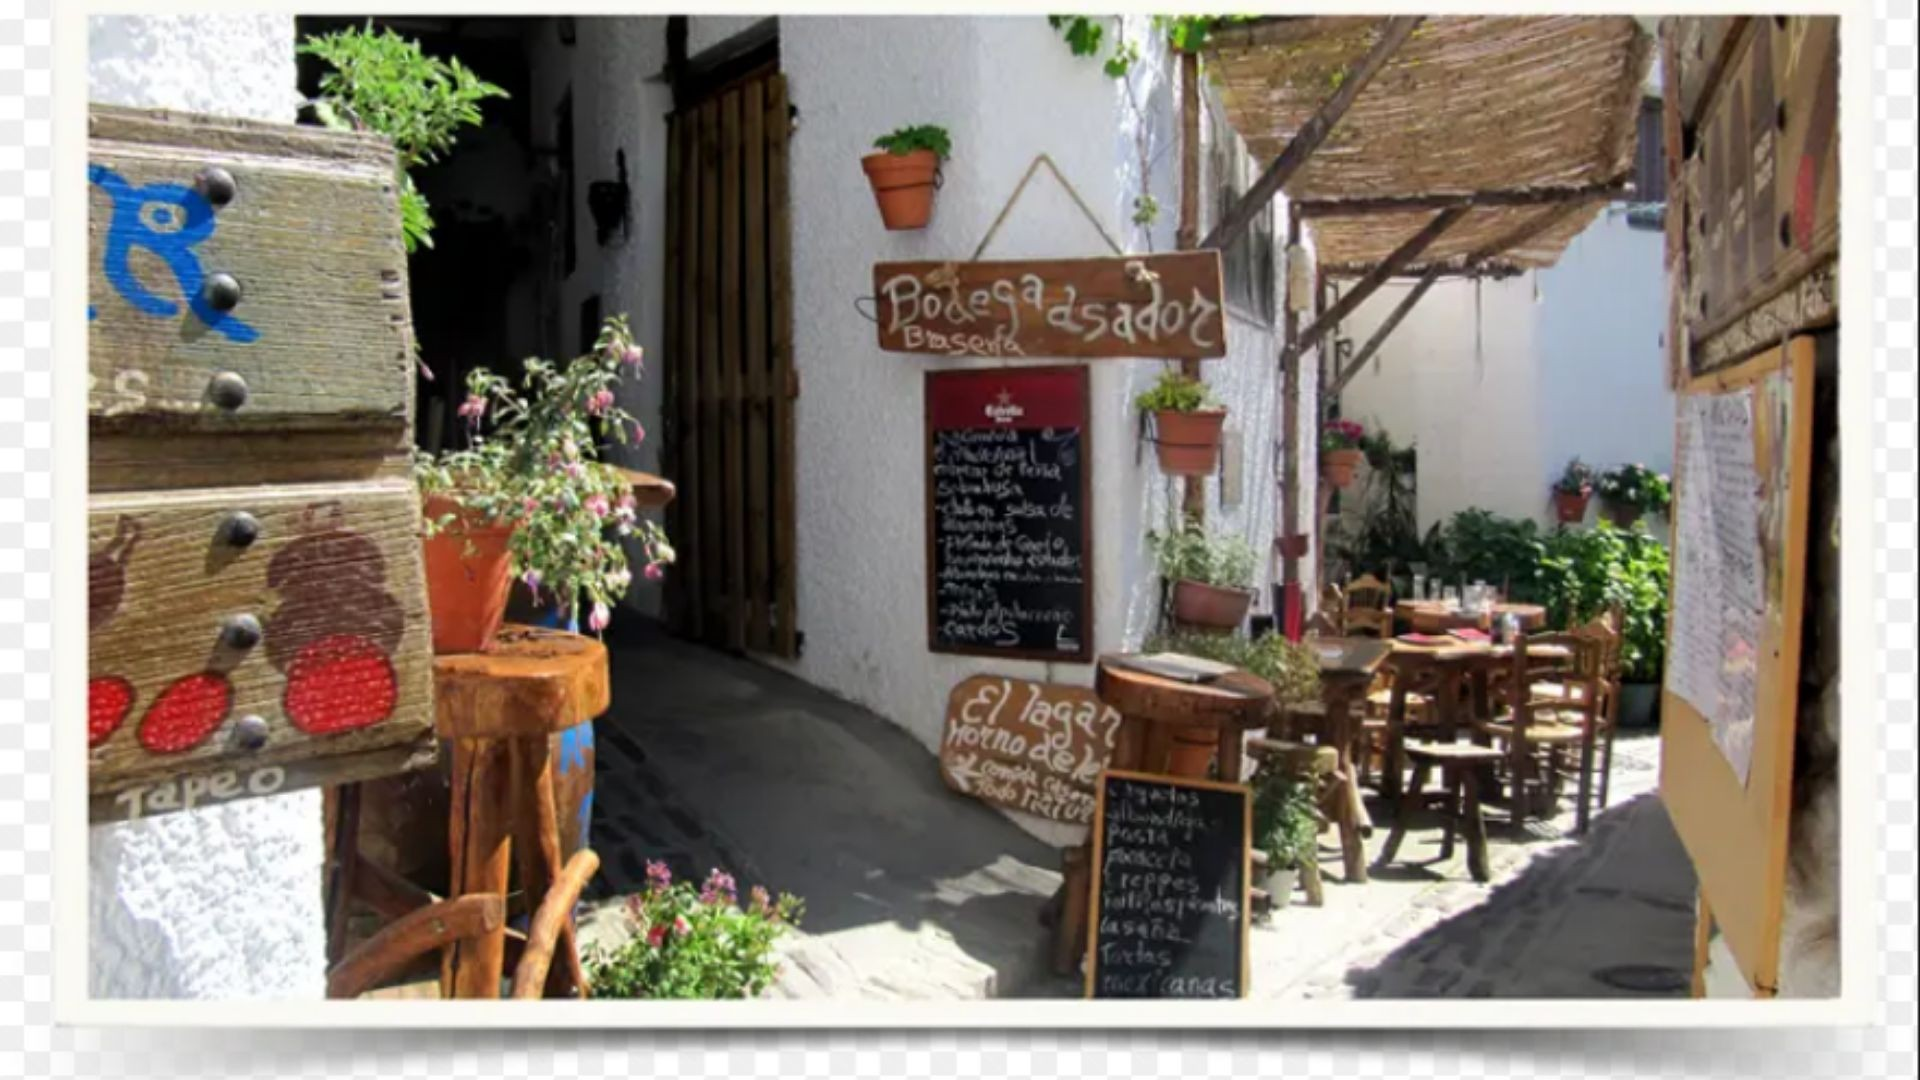 Restaurante y asador en Pampaneira